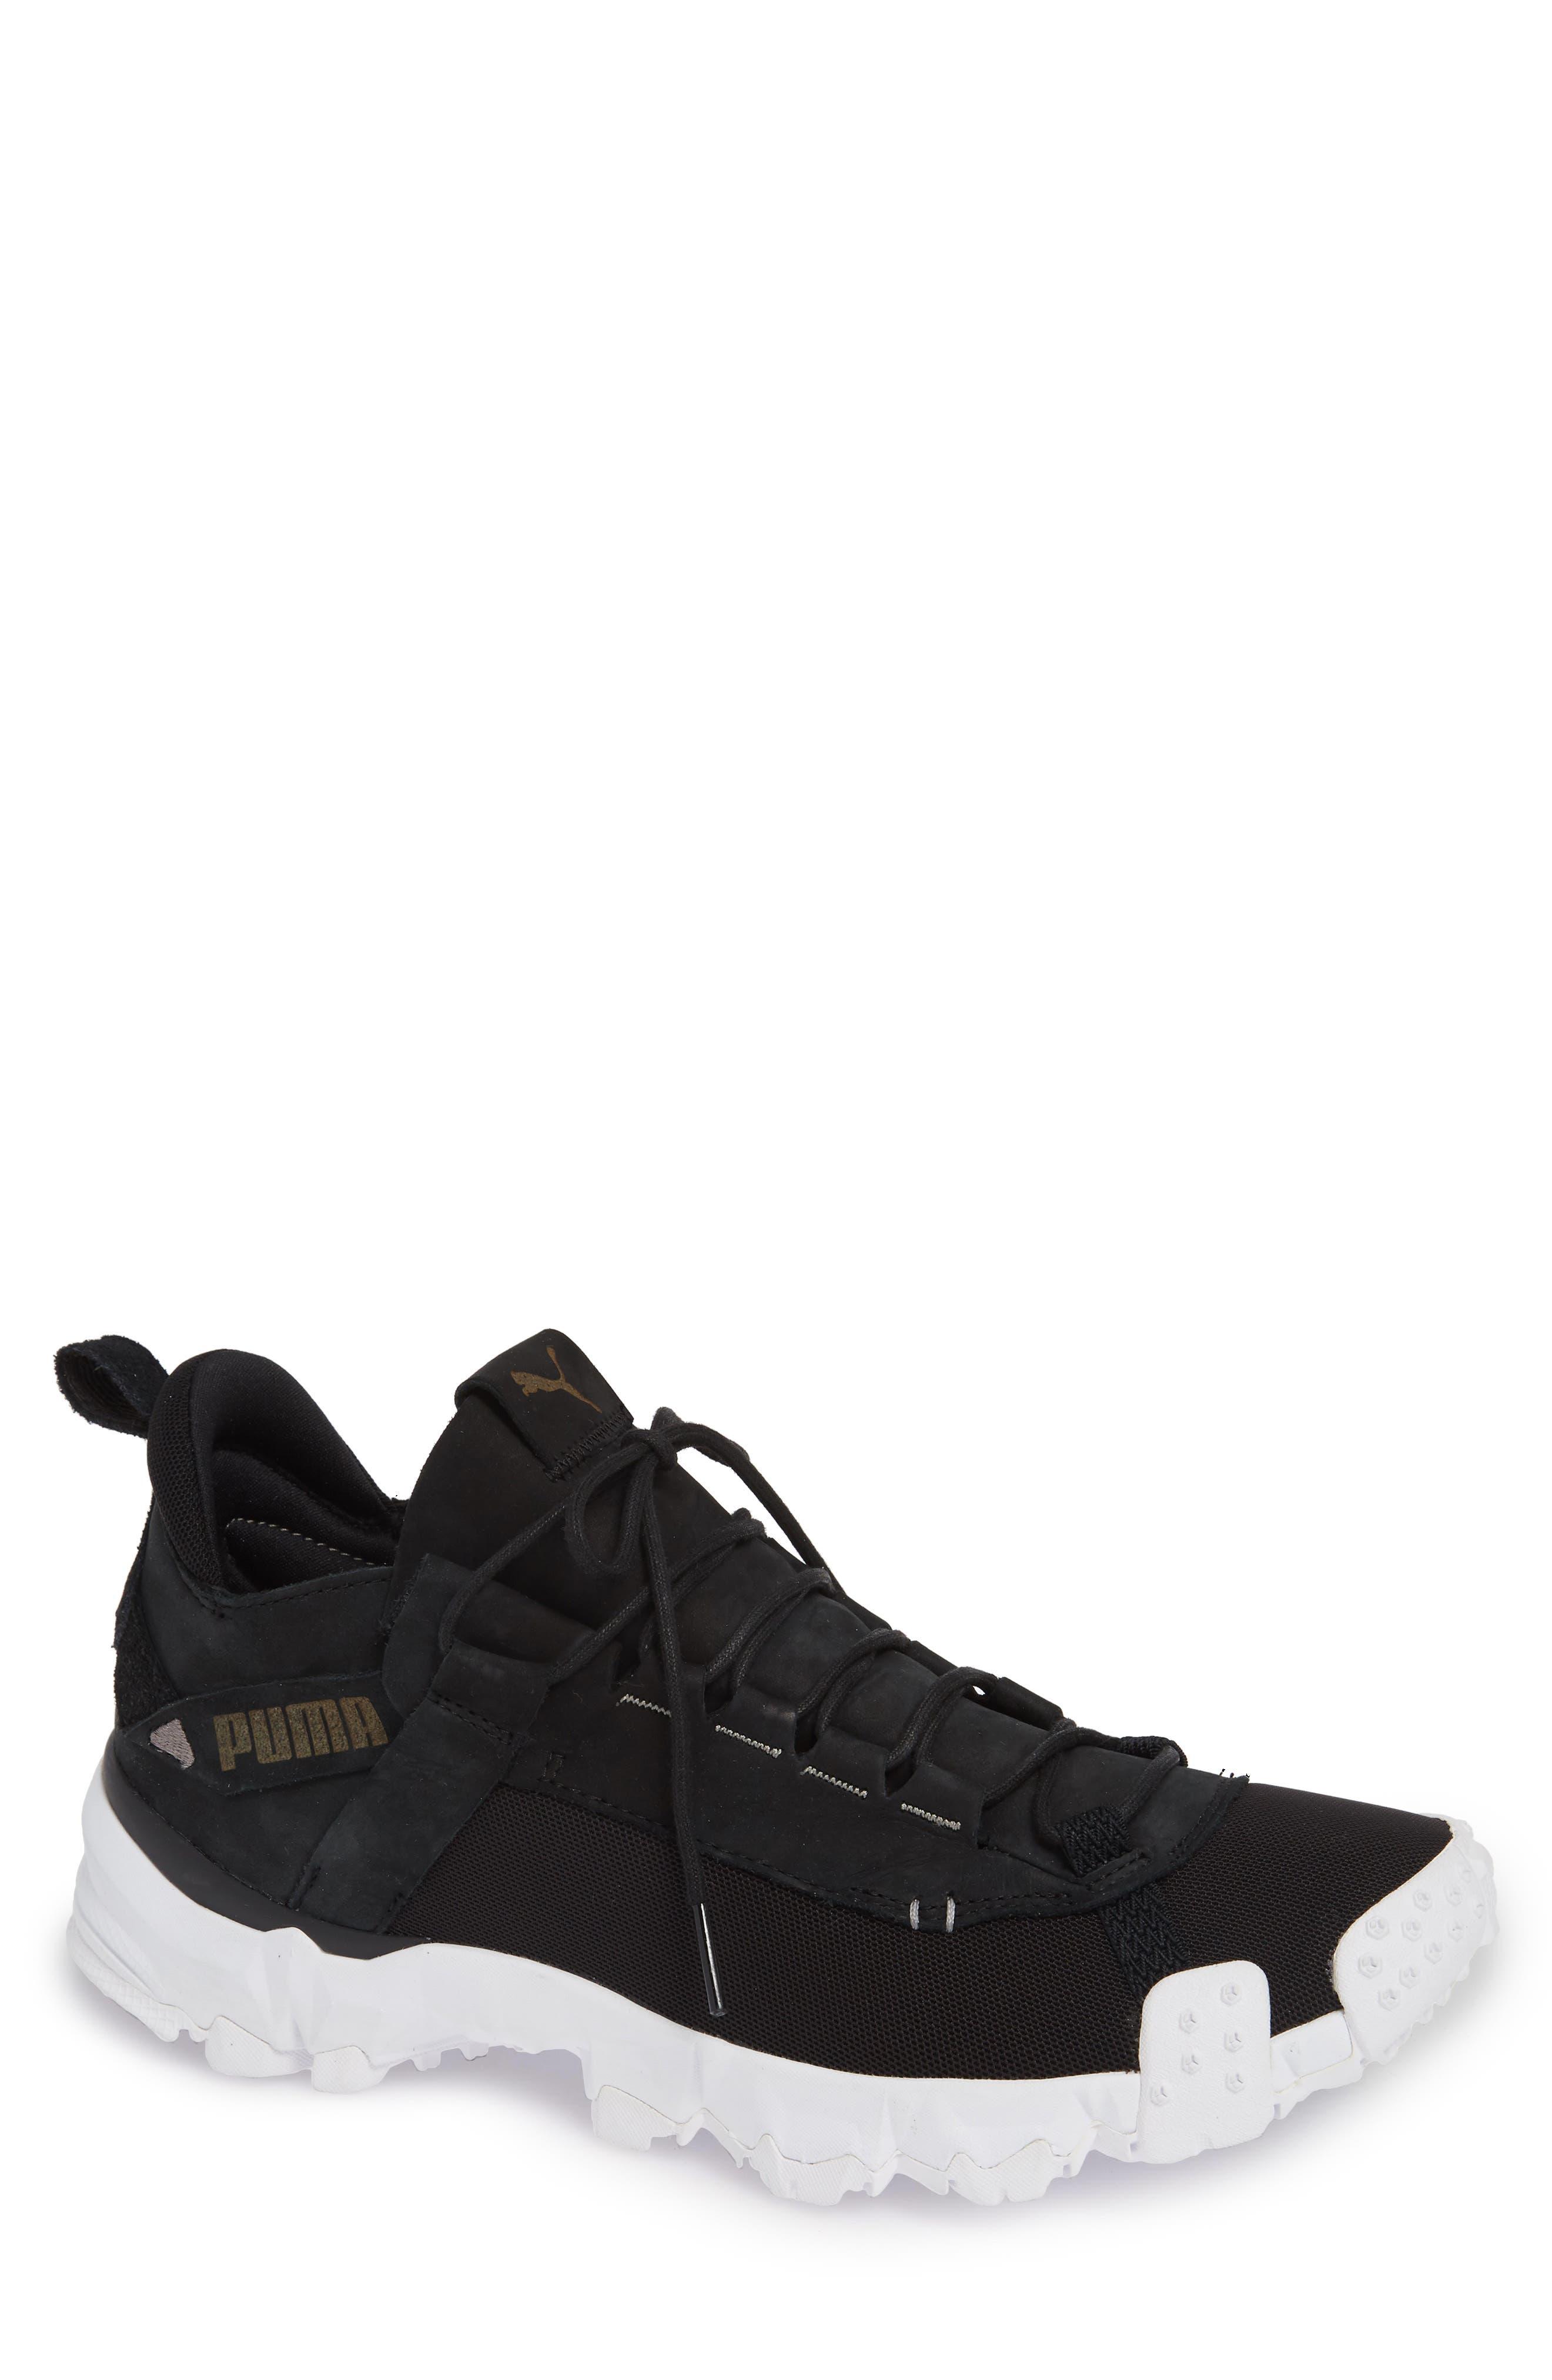 Trailfox Sneaker,                         Main,                         color, BLACK/ WHITE